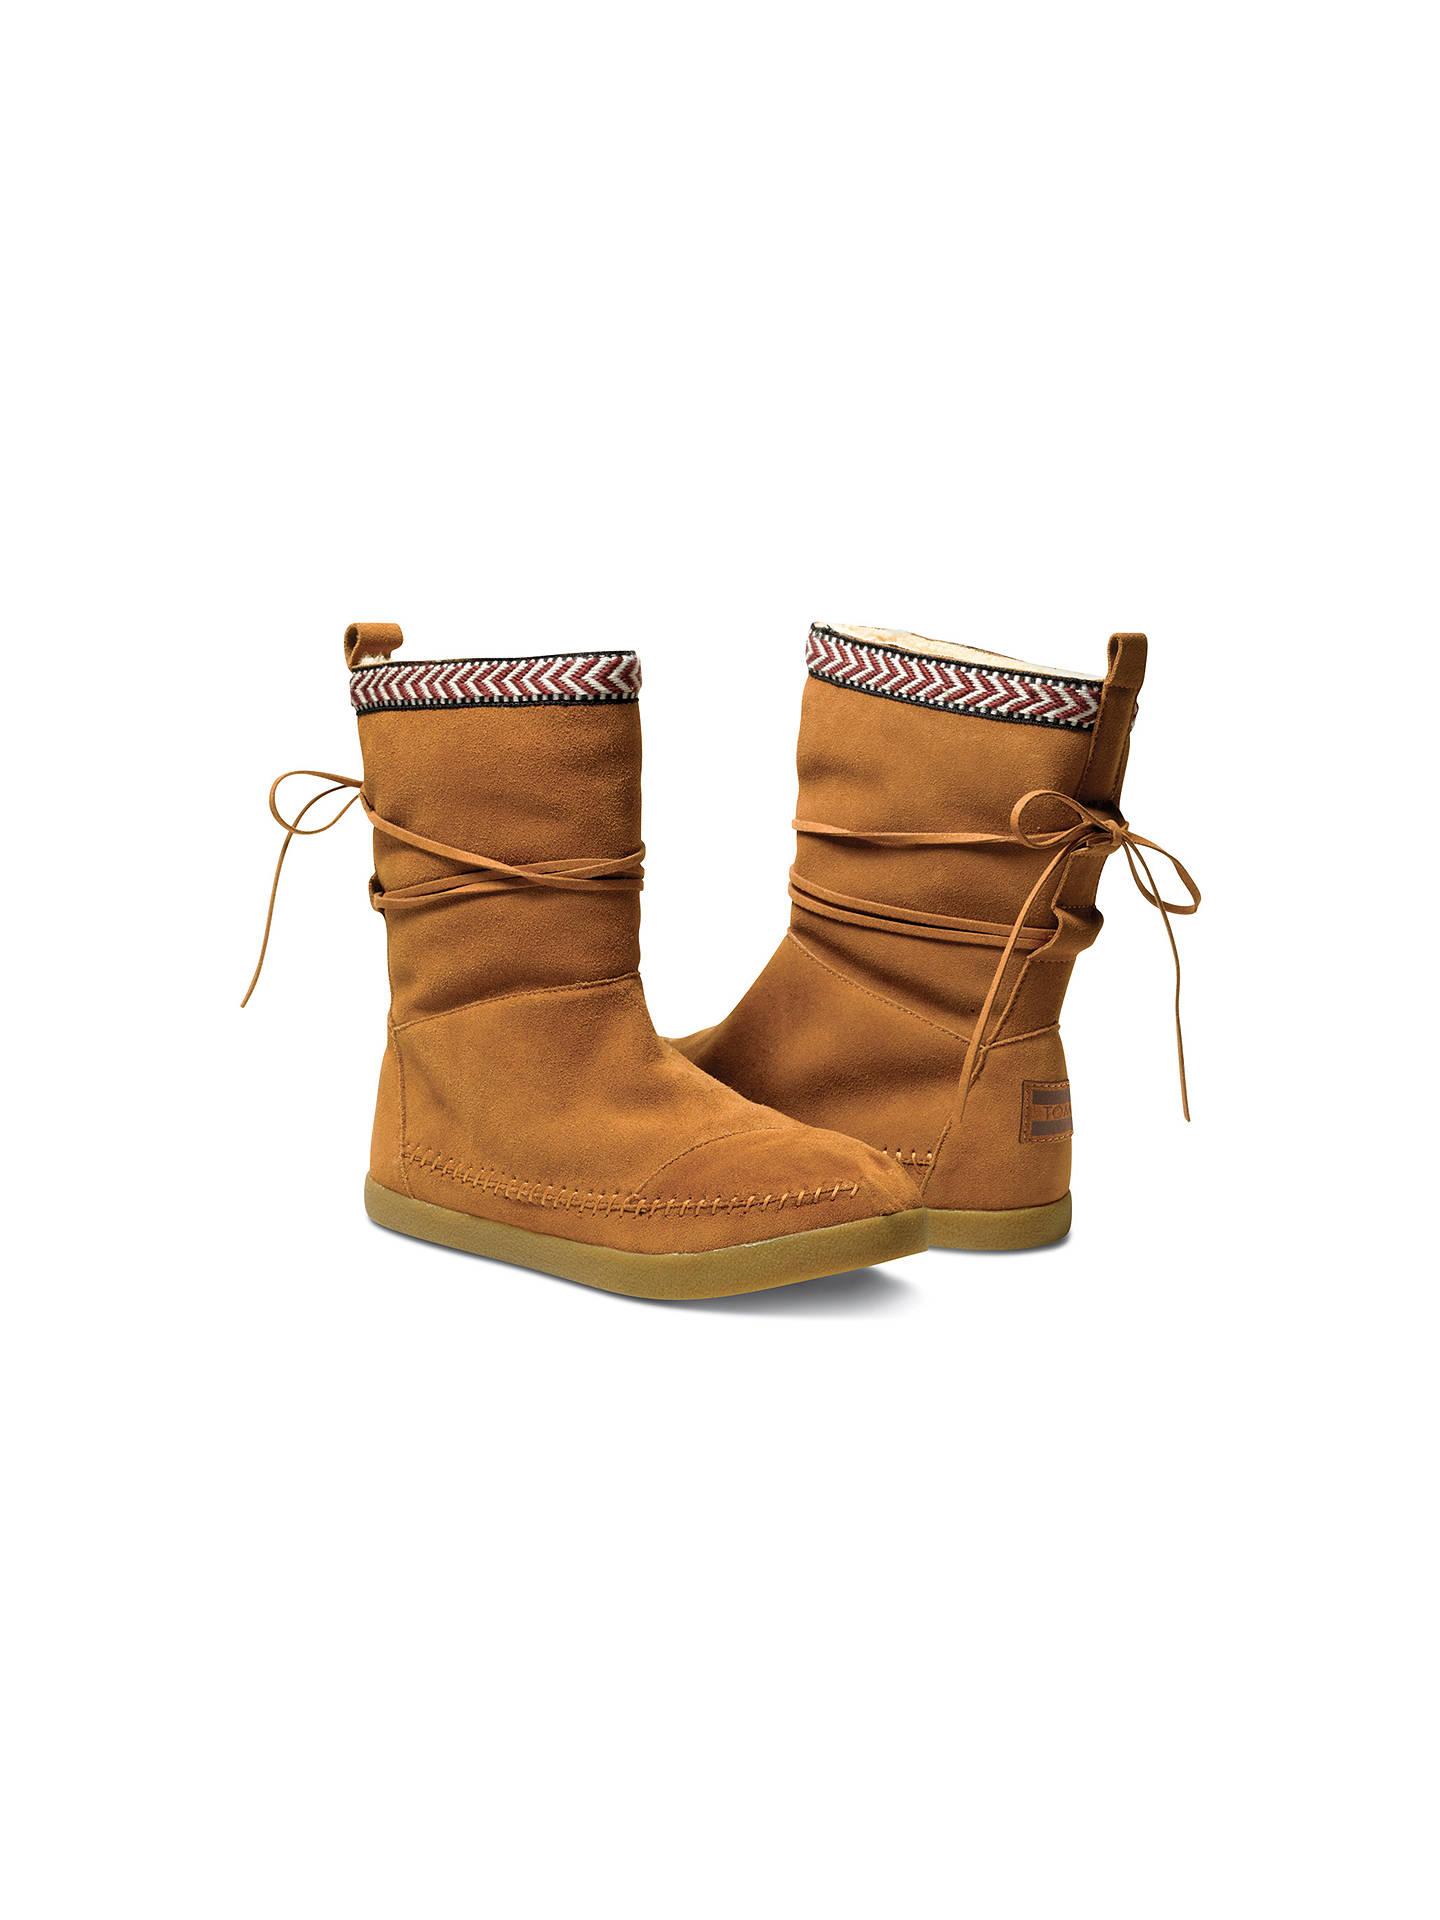 c7879abaf1b ... BuyTOMS Nepal Suede Trim Boots